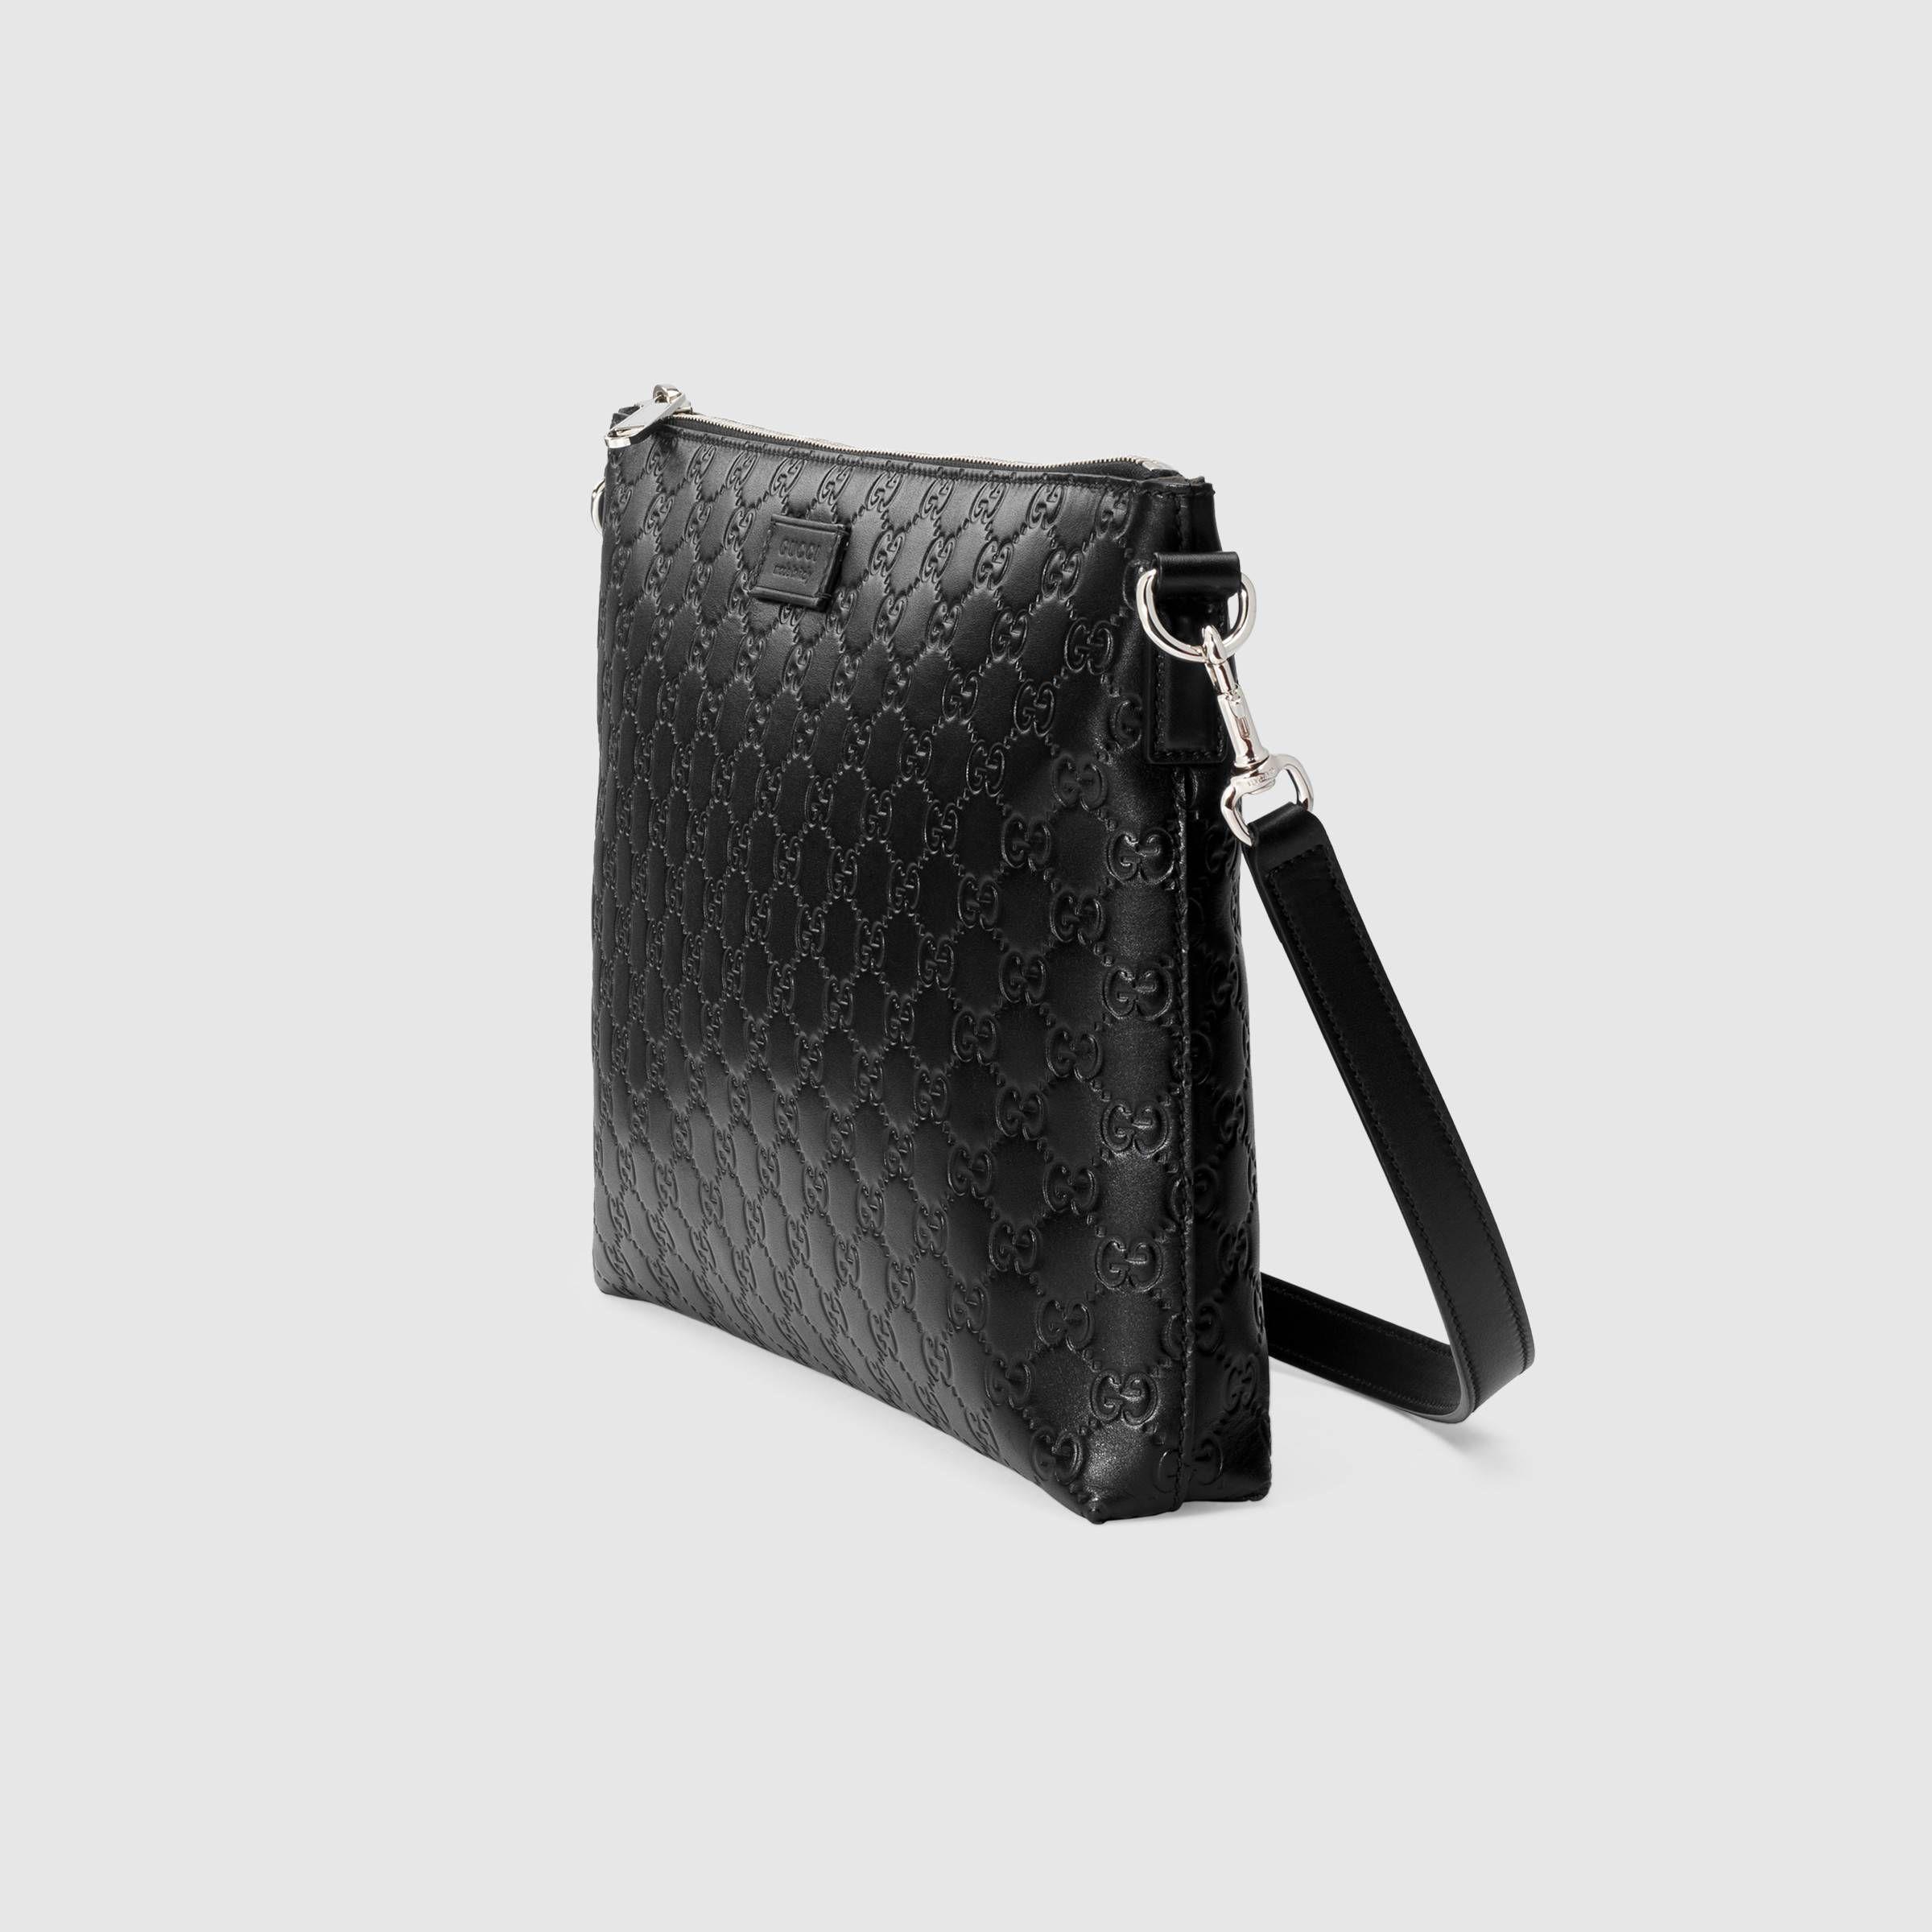 83060a15c8e8 Gucci Signature soft messenger in Black Gucci Signature soft leather with  black leather trims | Gucci Men's Messenger Bags